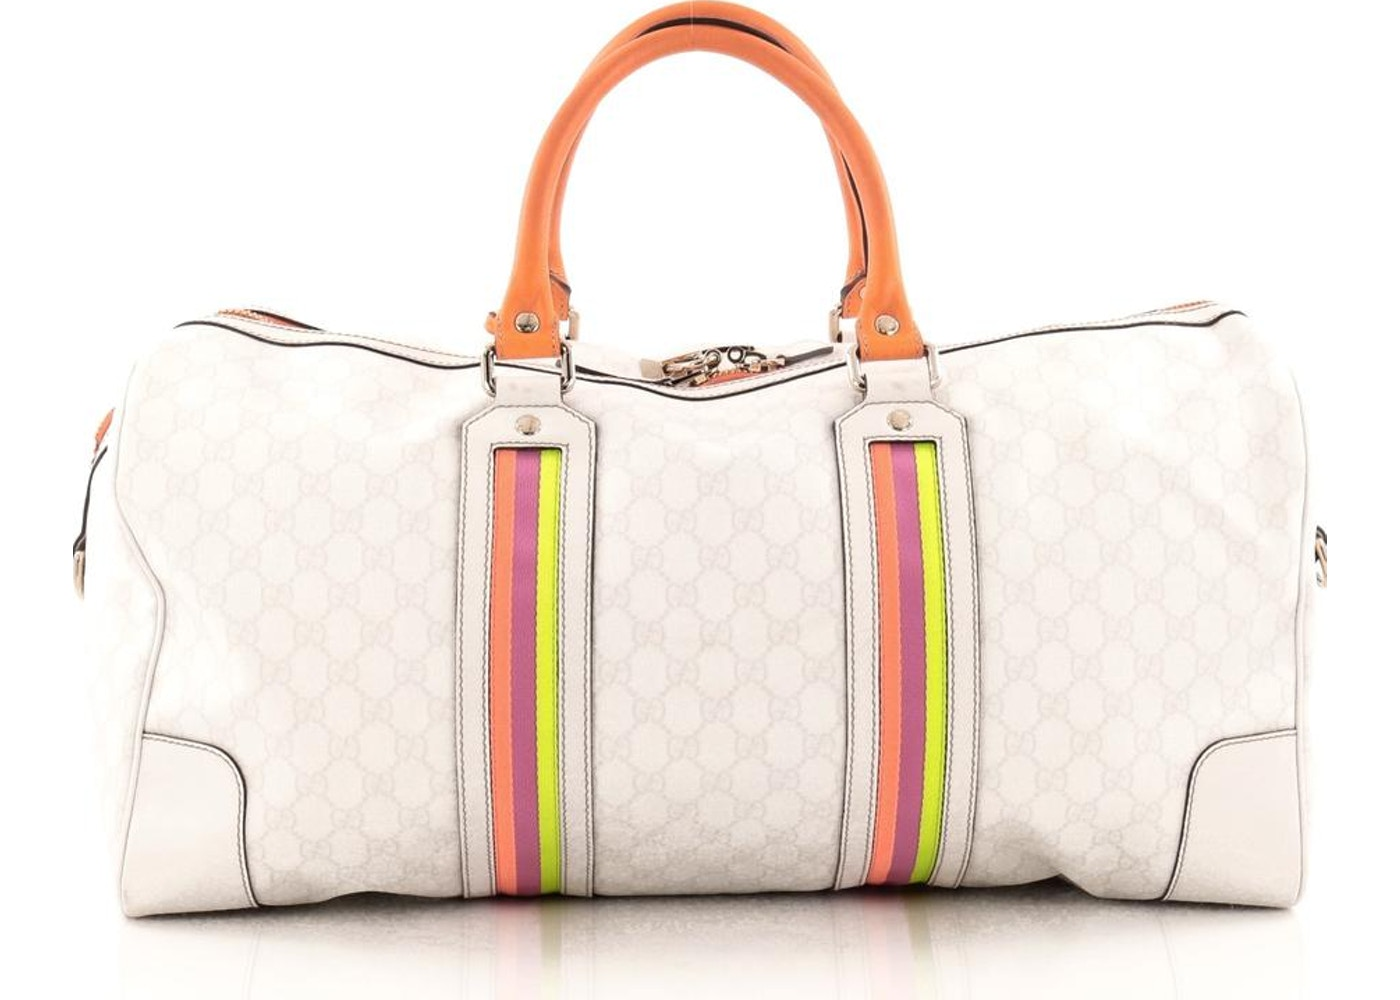 170873ca290 Gucci Convertible Duffle Bag GG Monogram Fluorescent Web Large  White Orange Purple Yellow